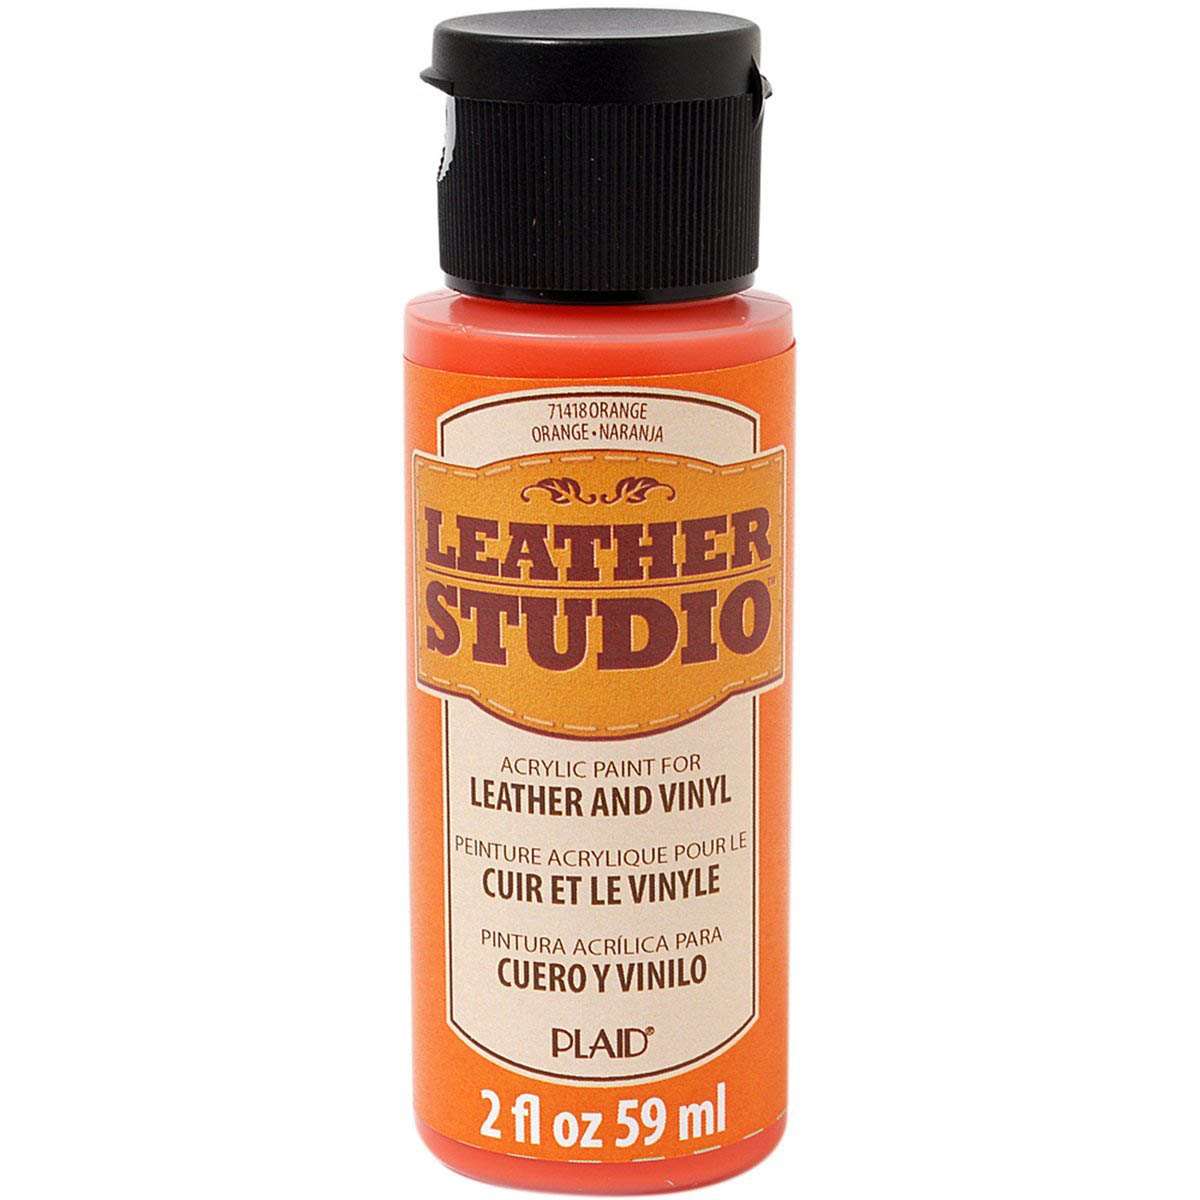 Leather Studio™ Leather & Vinyl Paint Colors - Orange, 2 oz. - 71418